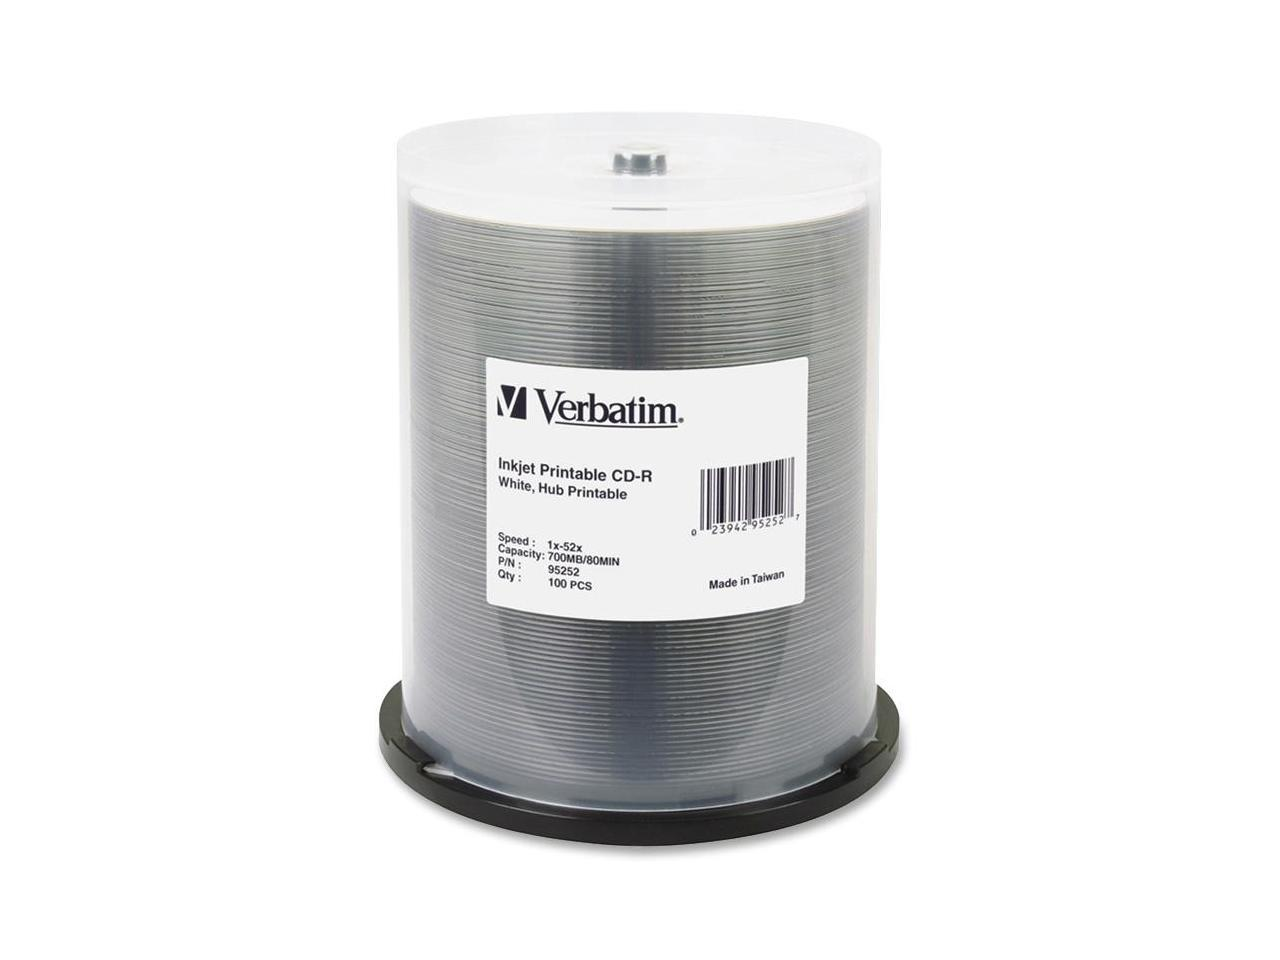 100pk Spindle OQCD52BWIPH-BX Optical Quantum CD-R 700MB 52X White Inkjet Hub Printable Recordable Media Disc